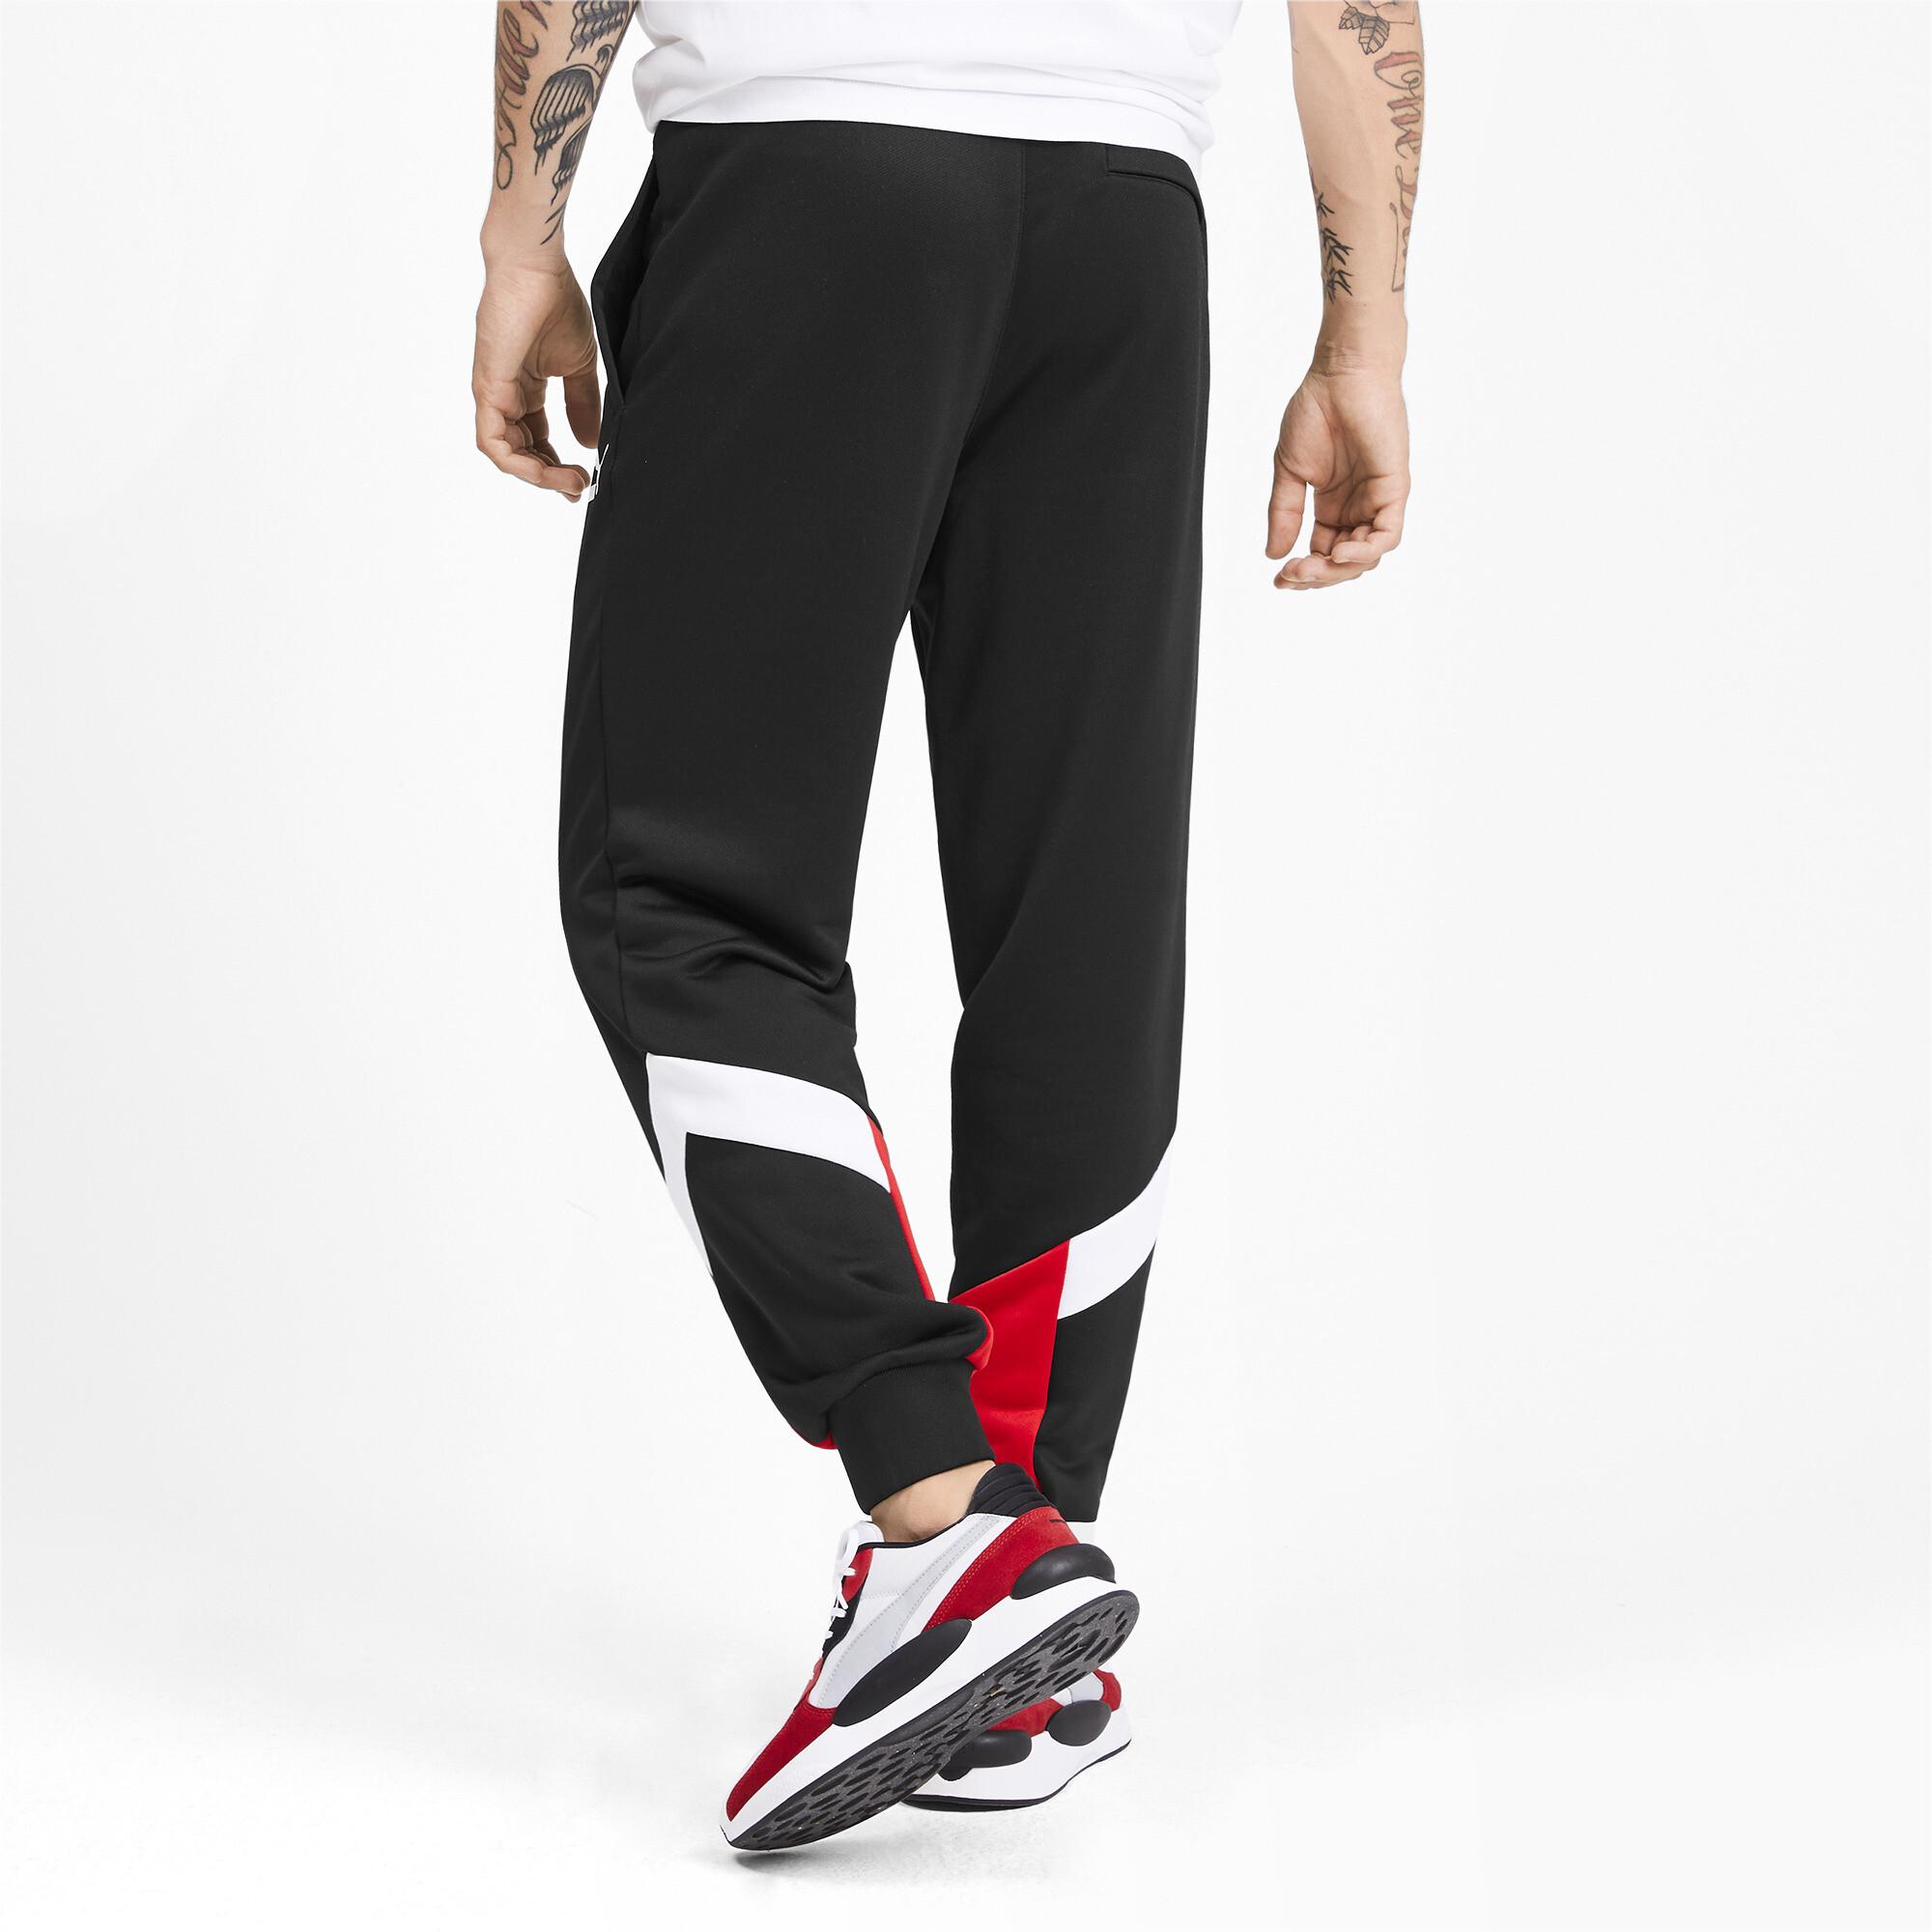 PUMA-Iconic-MCS-Men-039-s-Track-Pants-Men-Knitted-Pants-Sport-Classics thumbnail 5